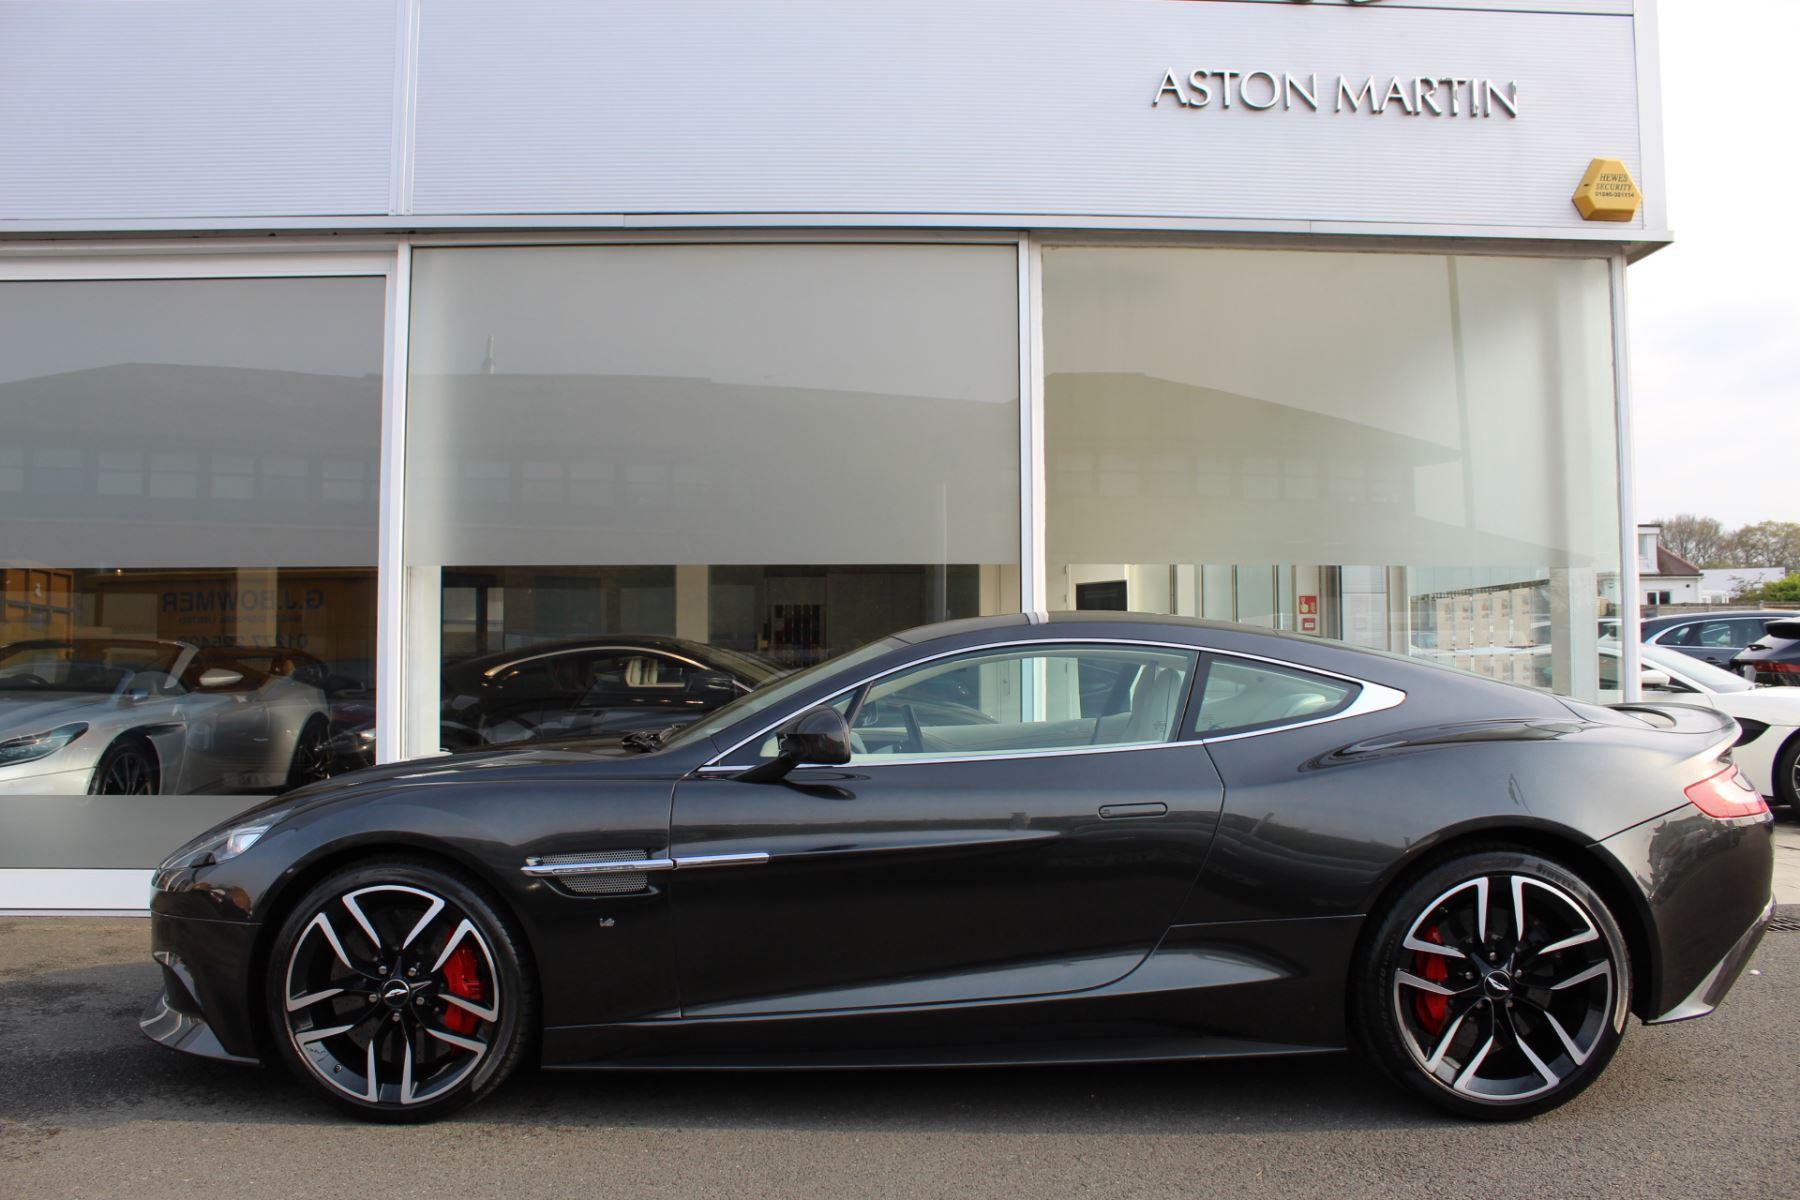 Aston Martin Vanquish V12 [568] 2+2 2dr Touchtronic image 8